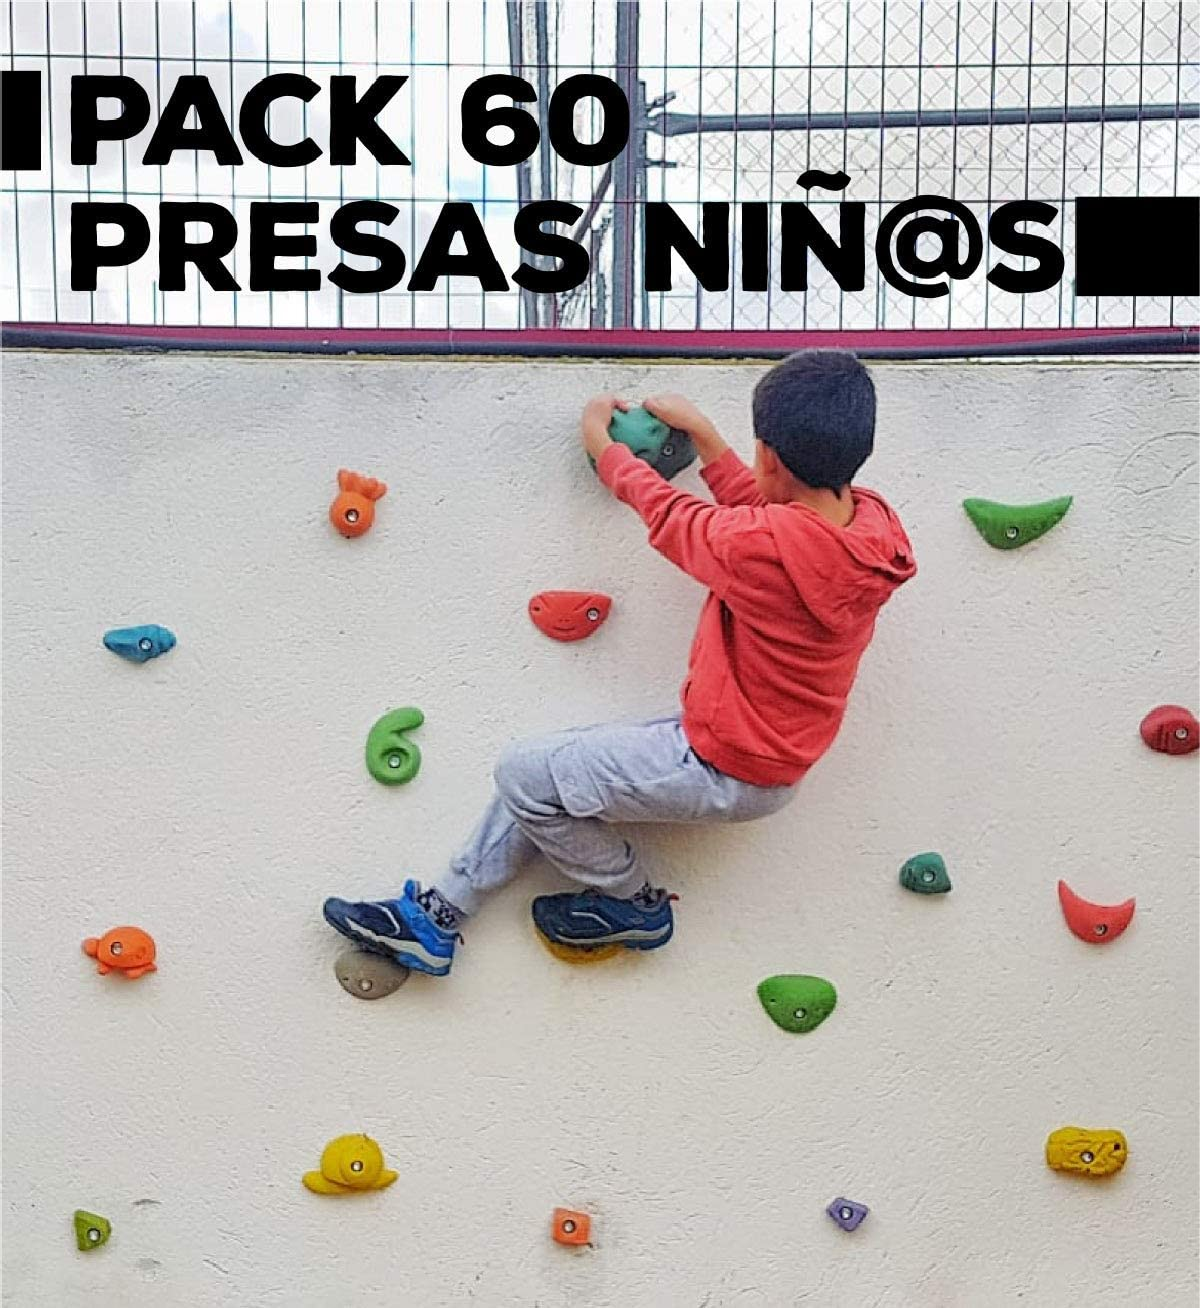 Pack de 63 presas de Escalada para niños. Tornilleria ...